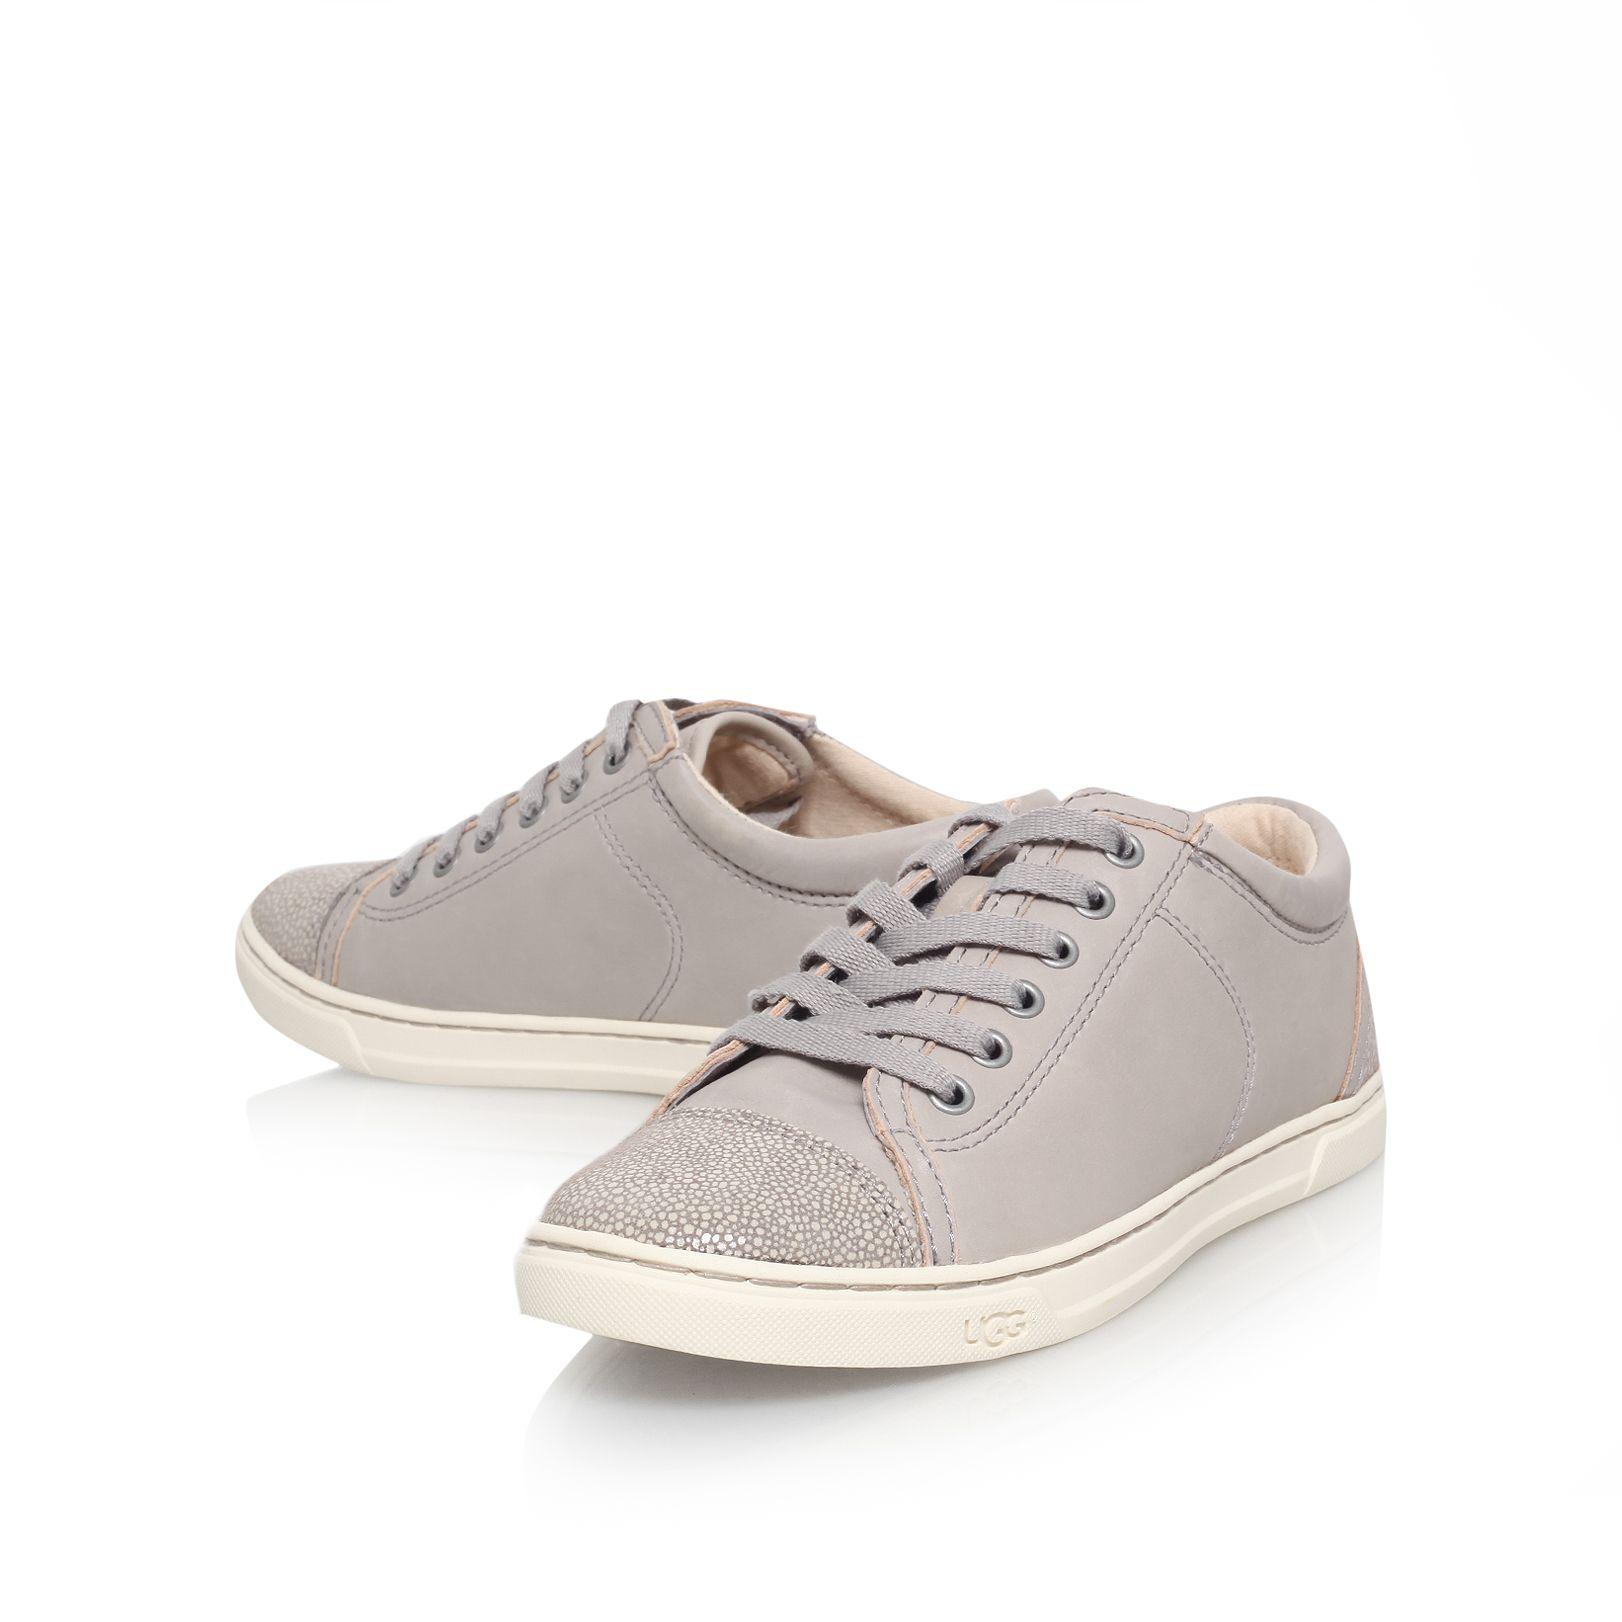 grey ugg high tops